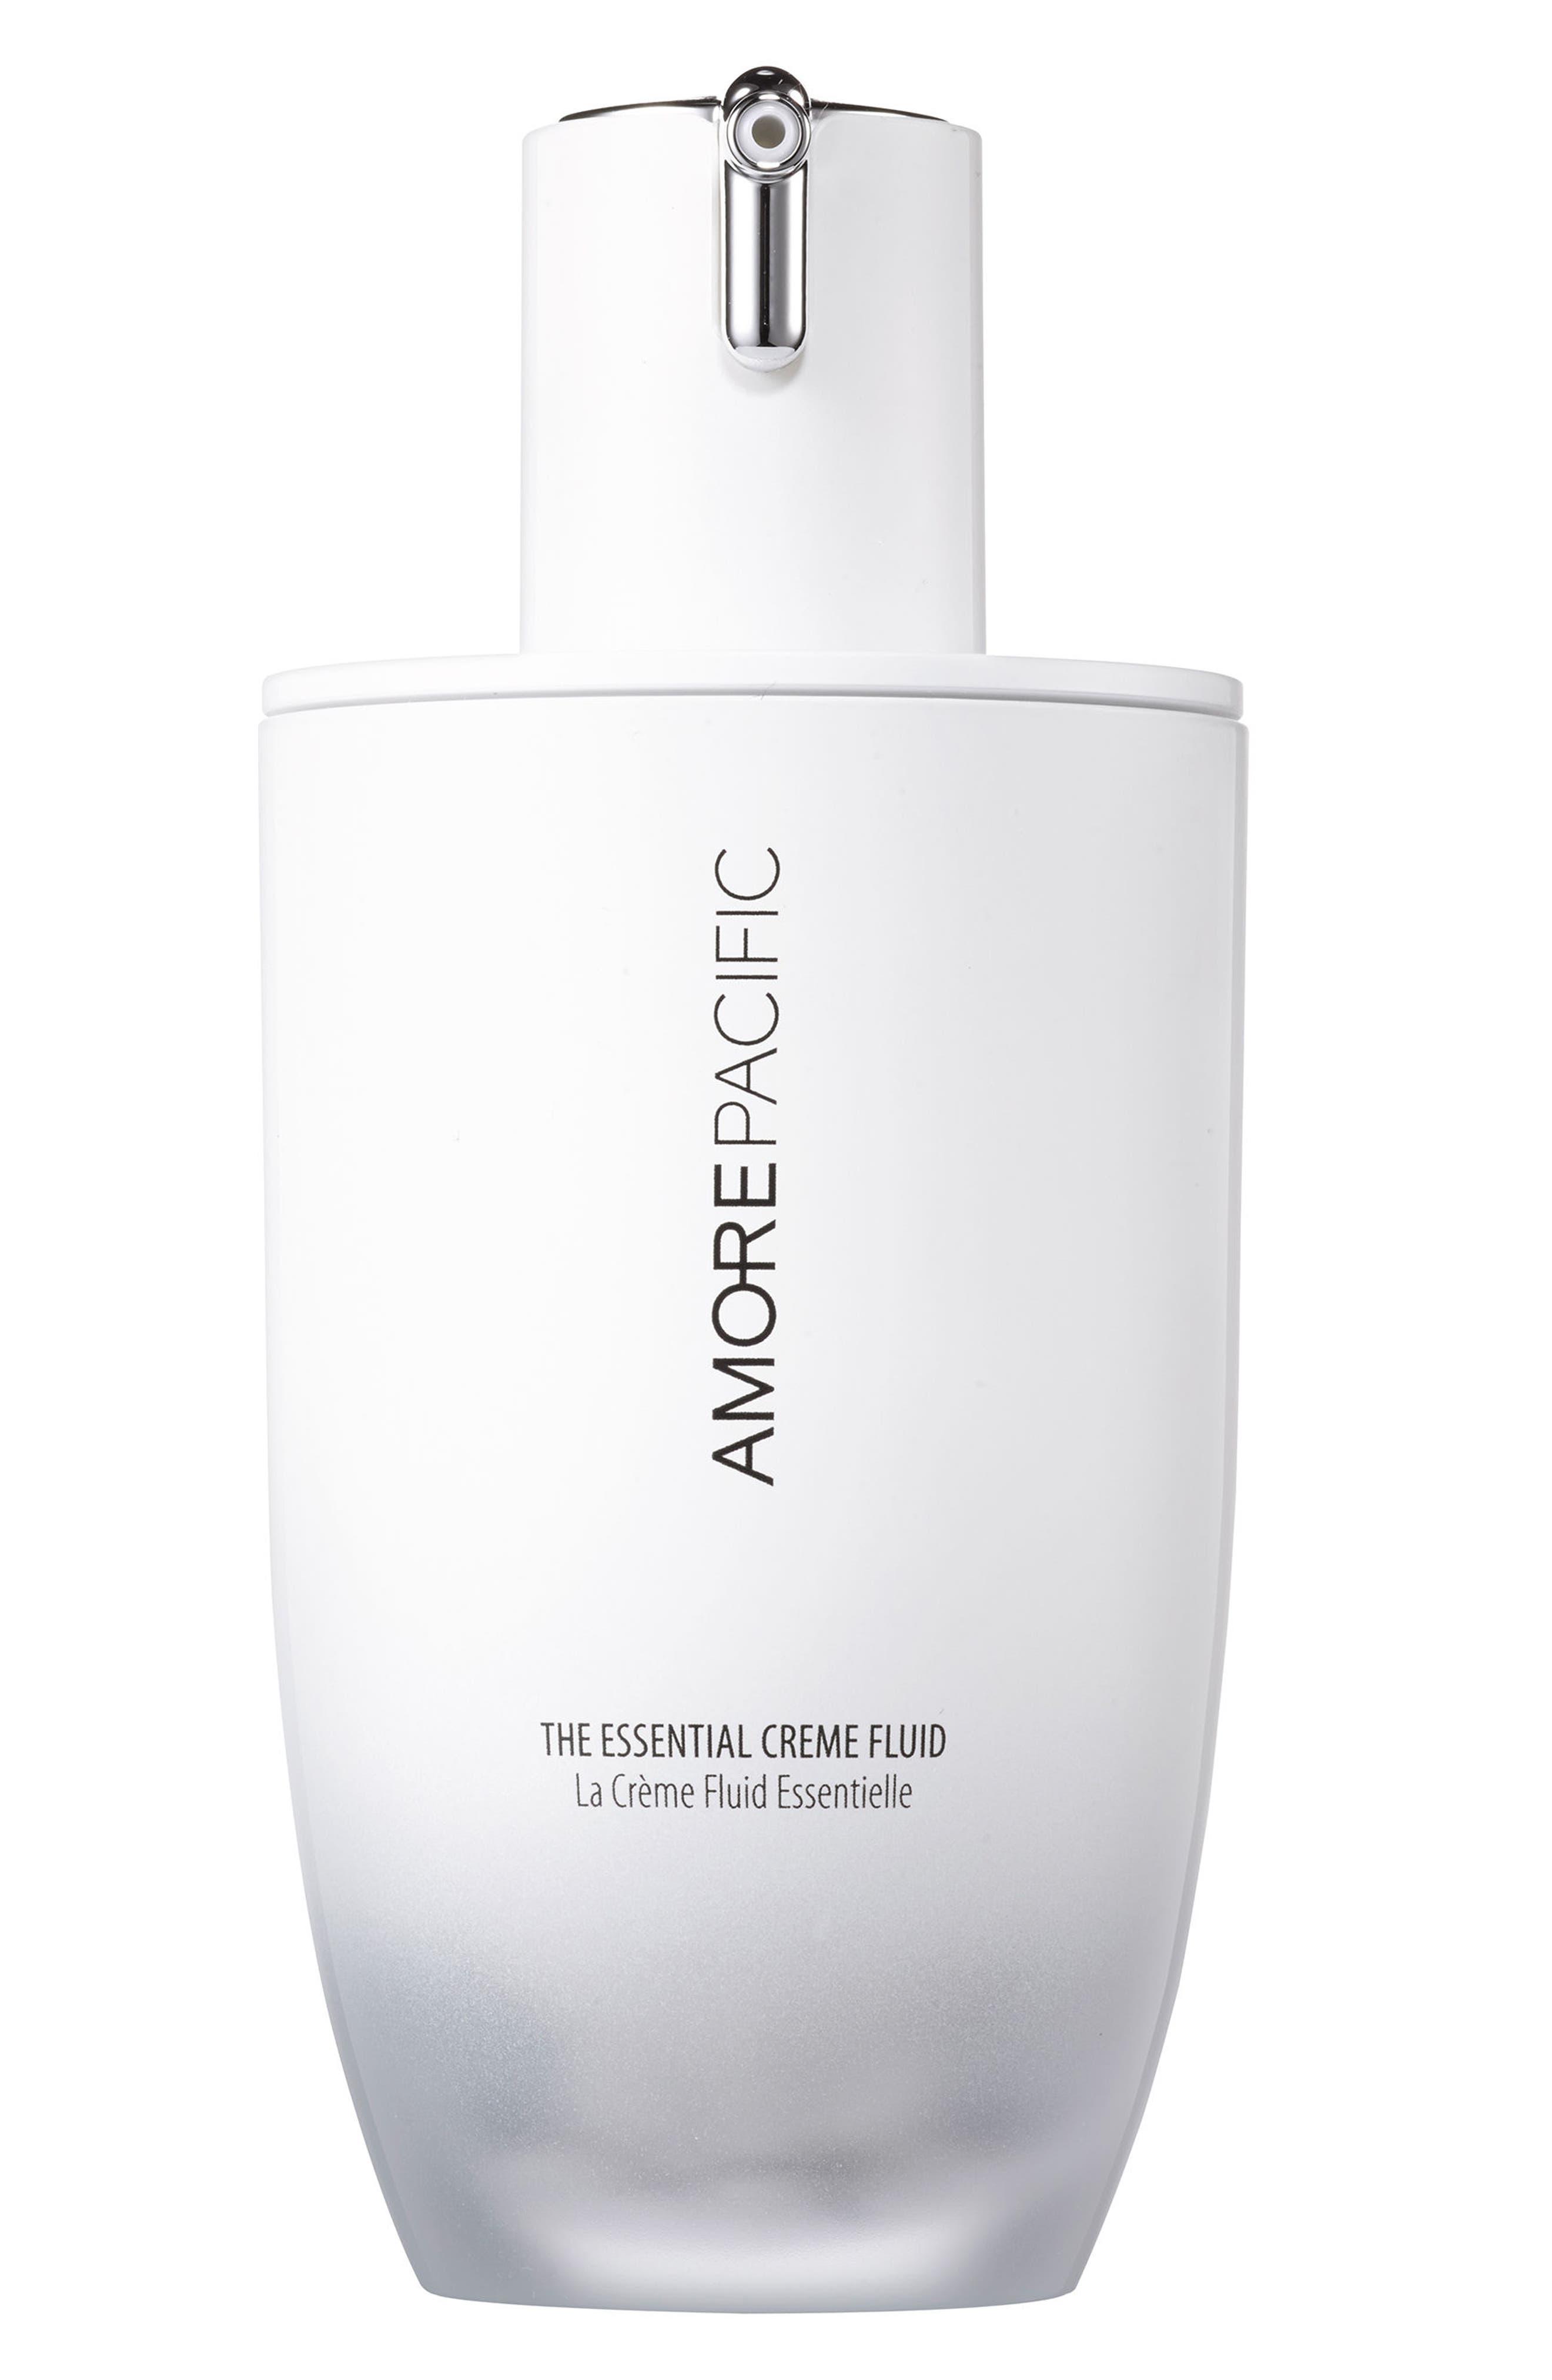 AMOREPACIFIC The Essential Crème Fluid